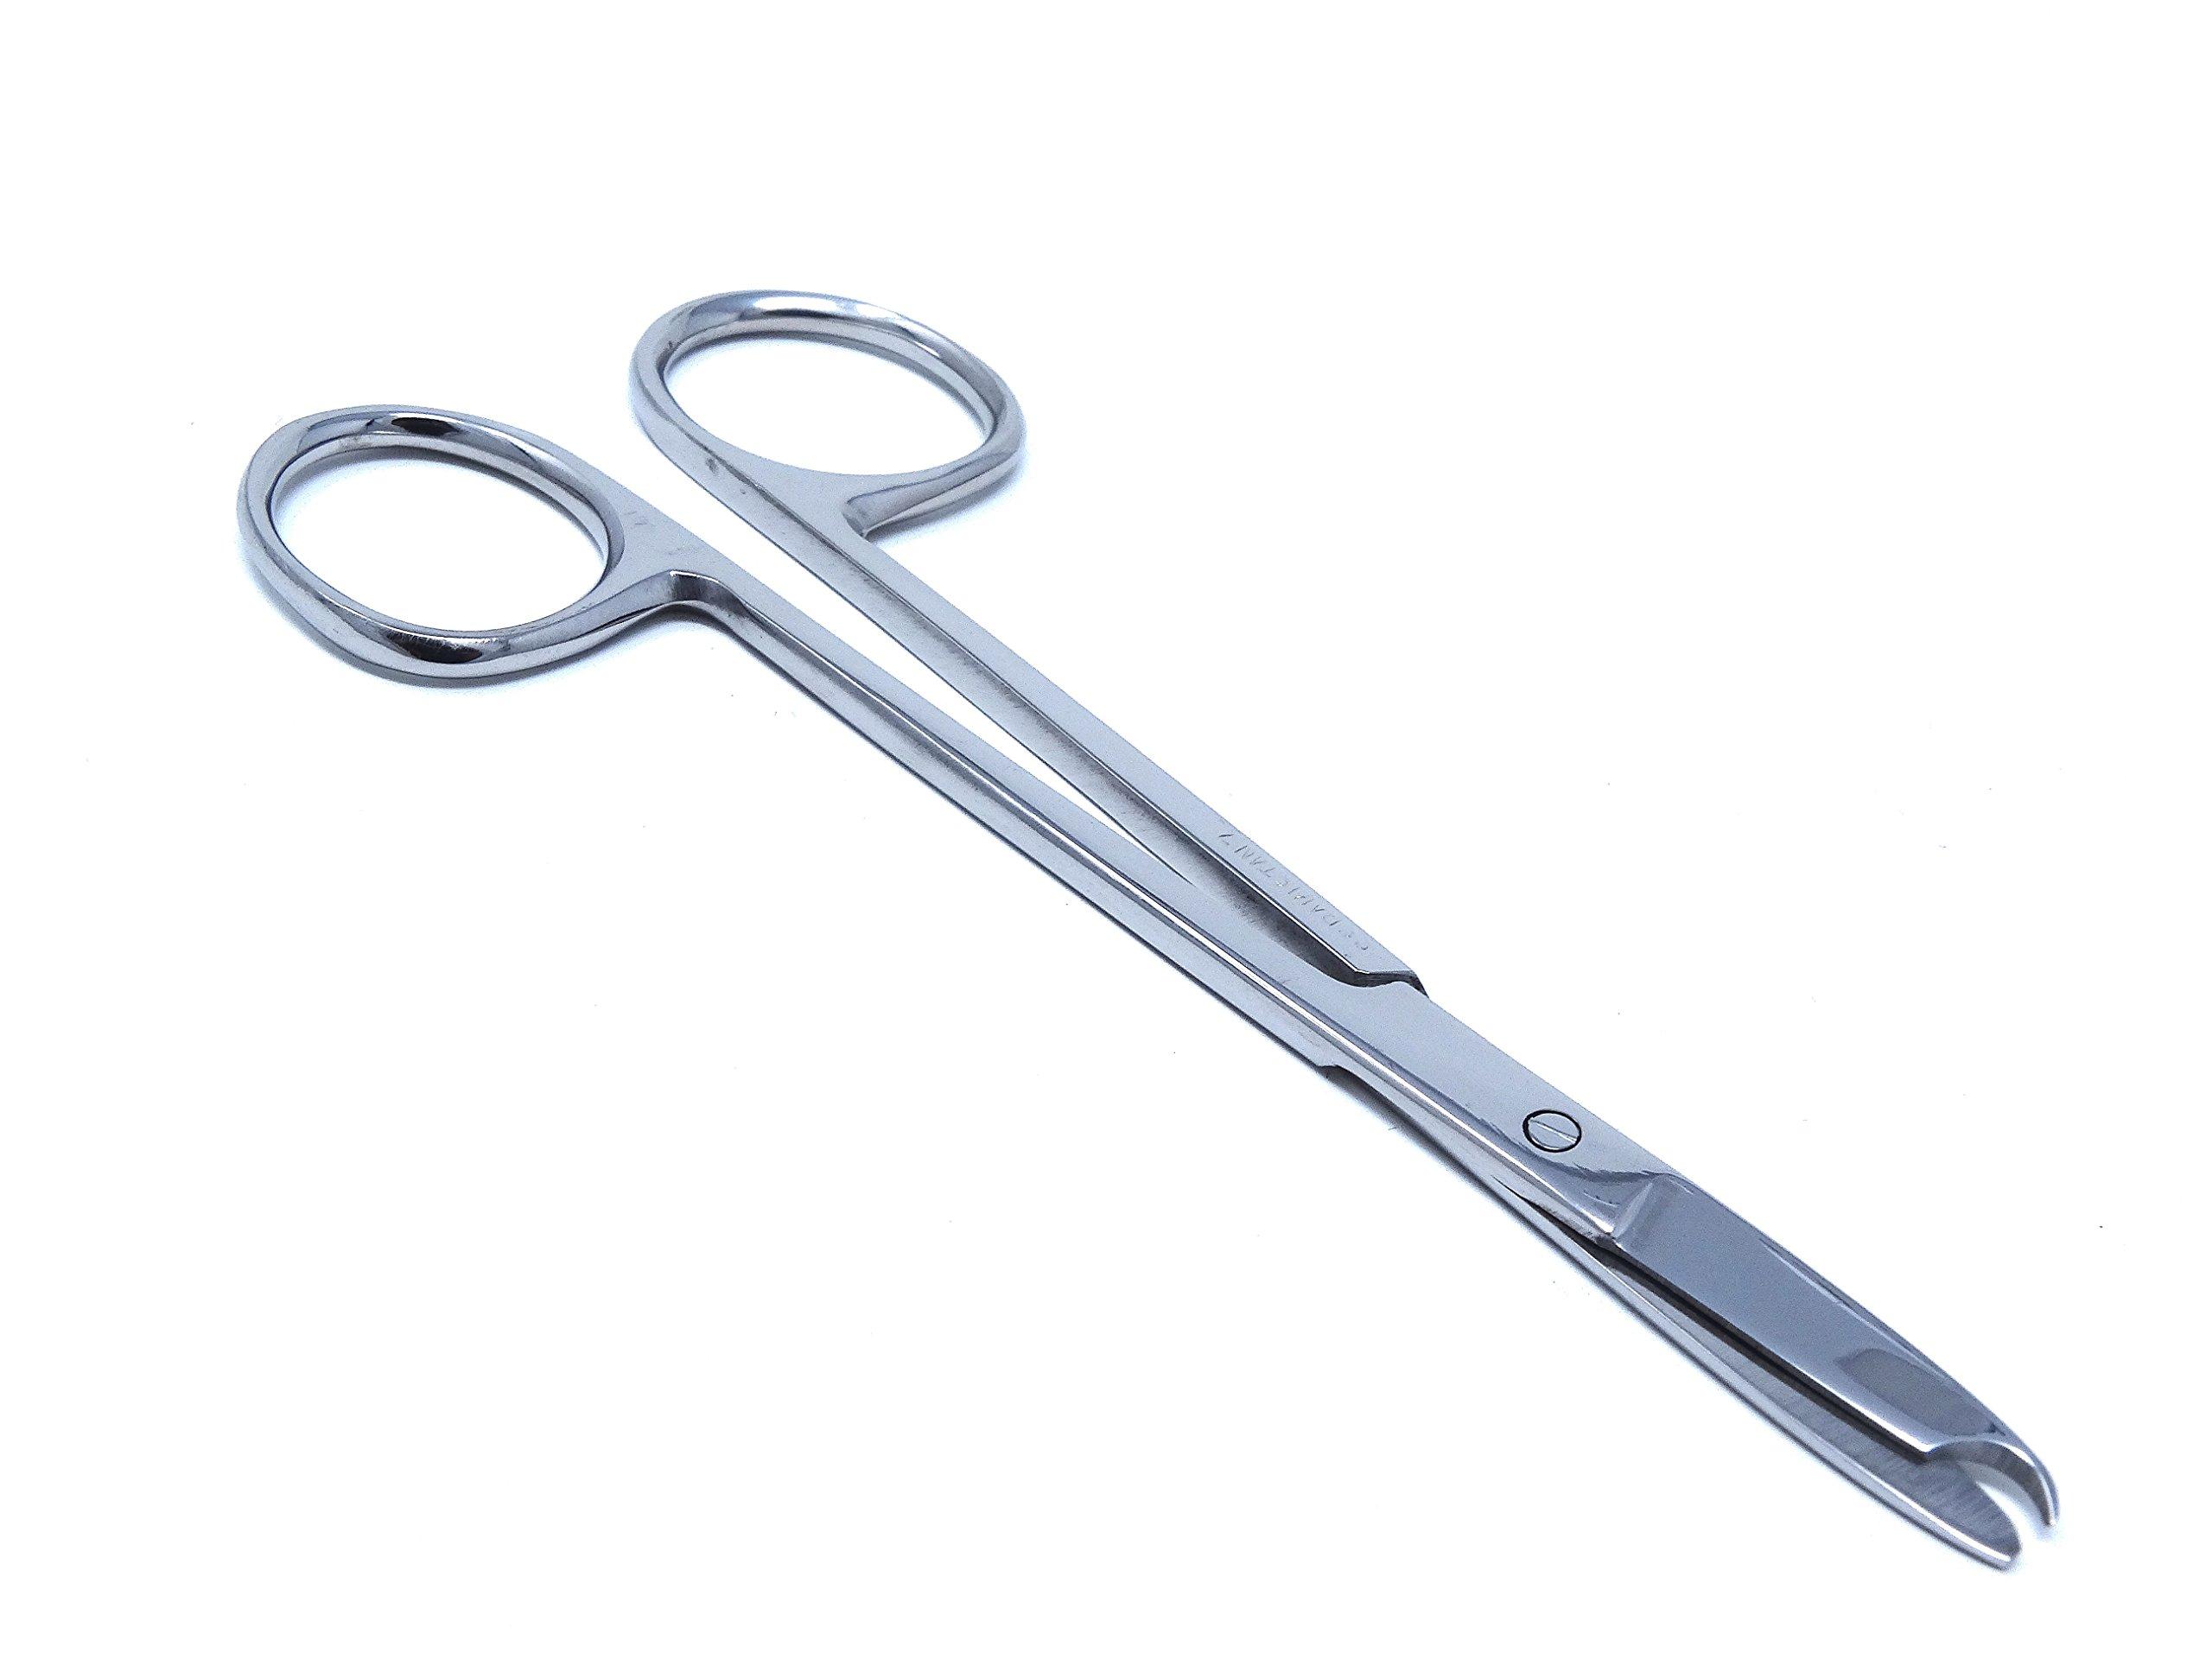 STT-SUT45 Premium High Polish Suture Stitch Scissors 4.5'' (11.43cm) Stainless Steel